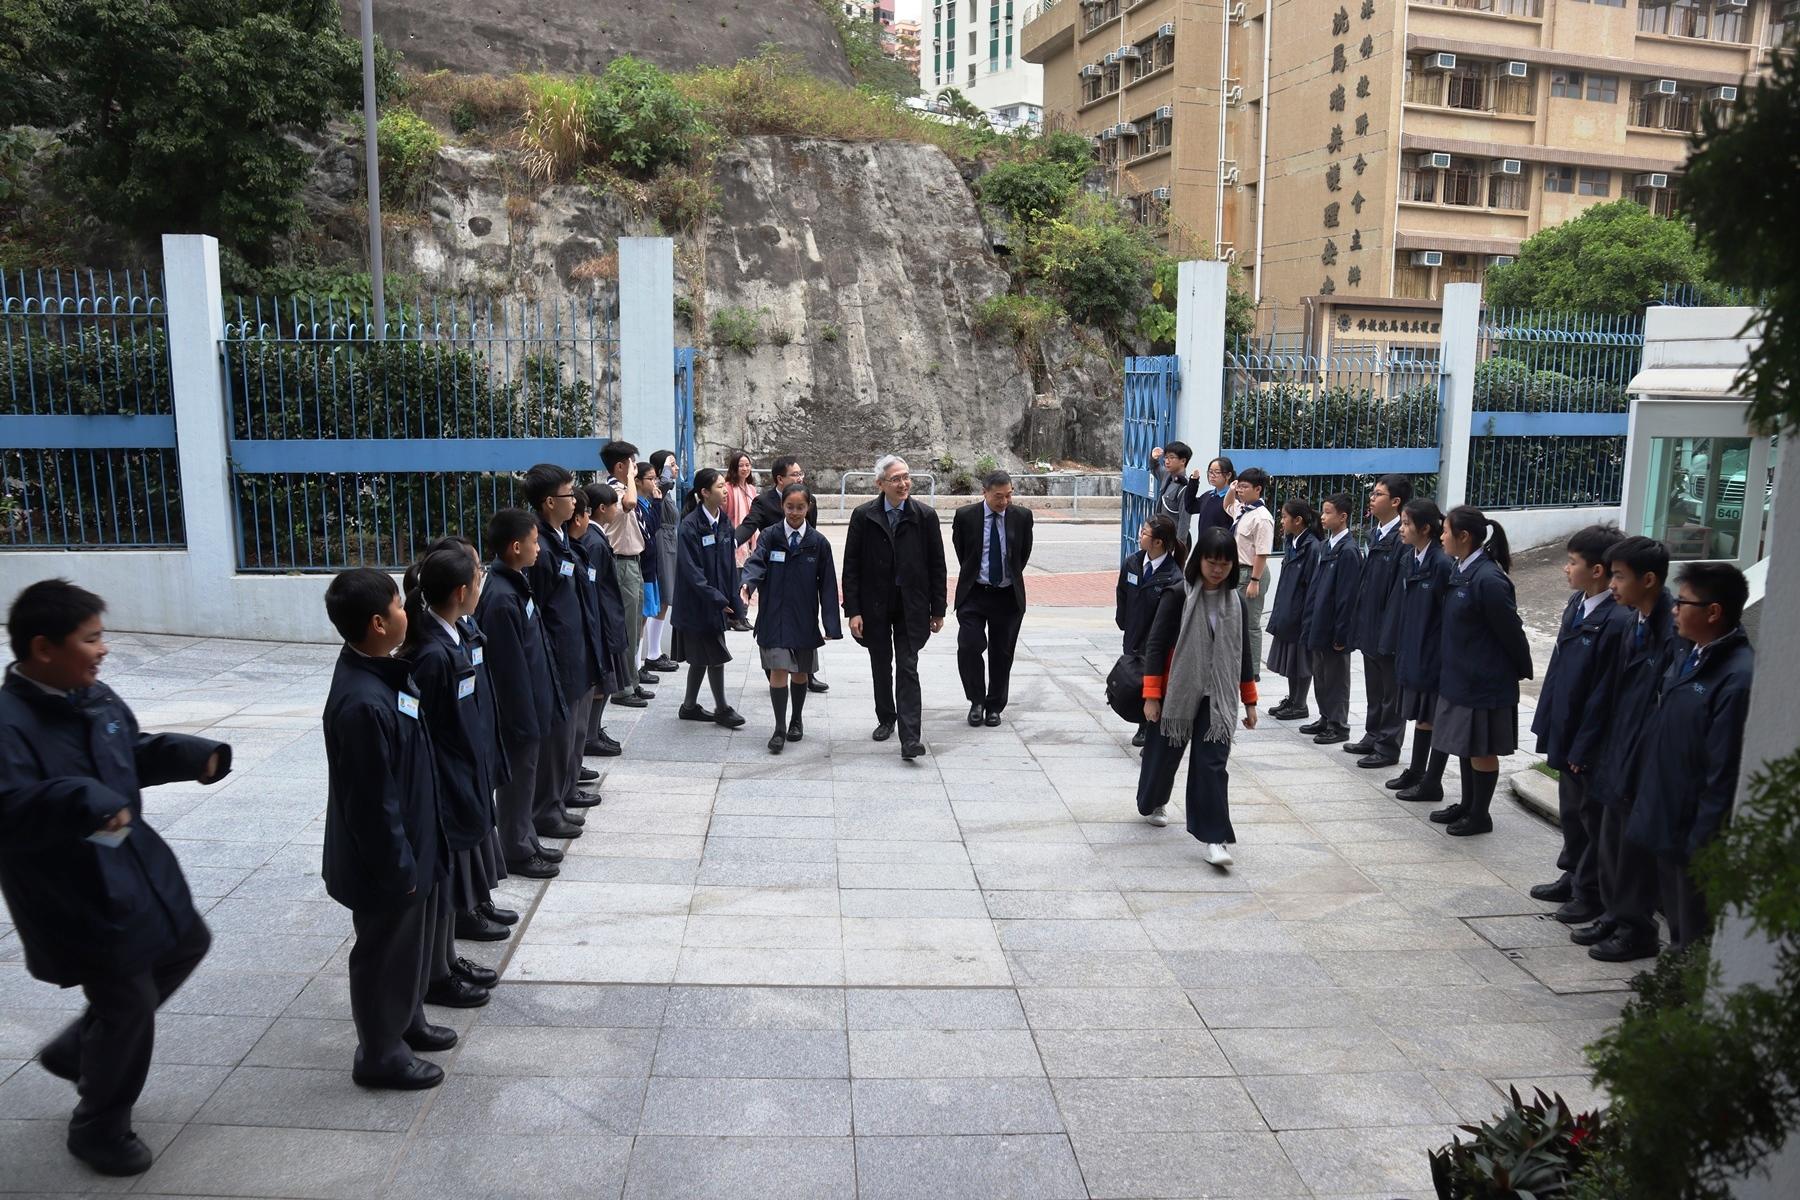 http://npc.edu.hk/sites/default/files/img_9611.jpg